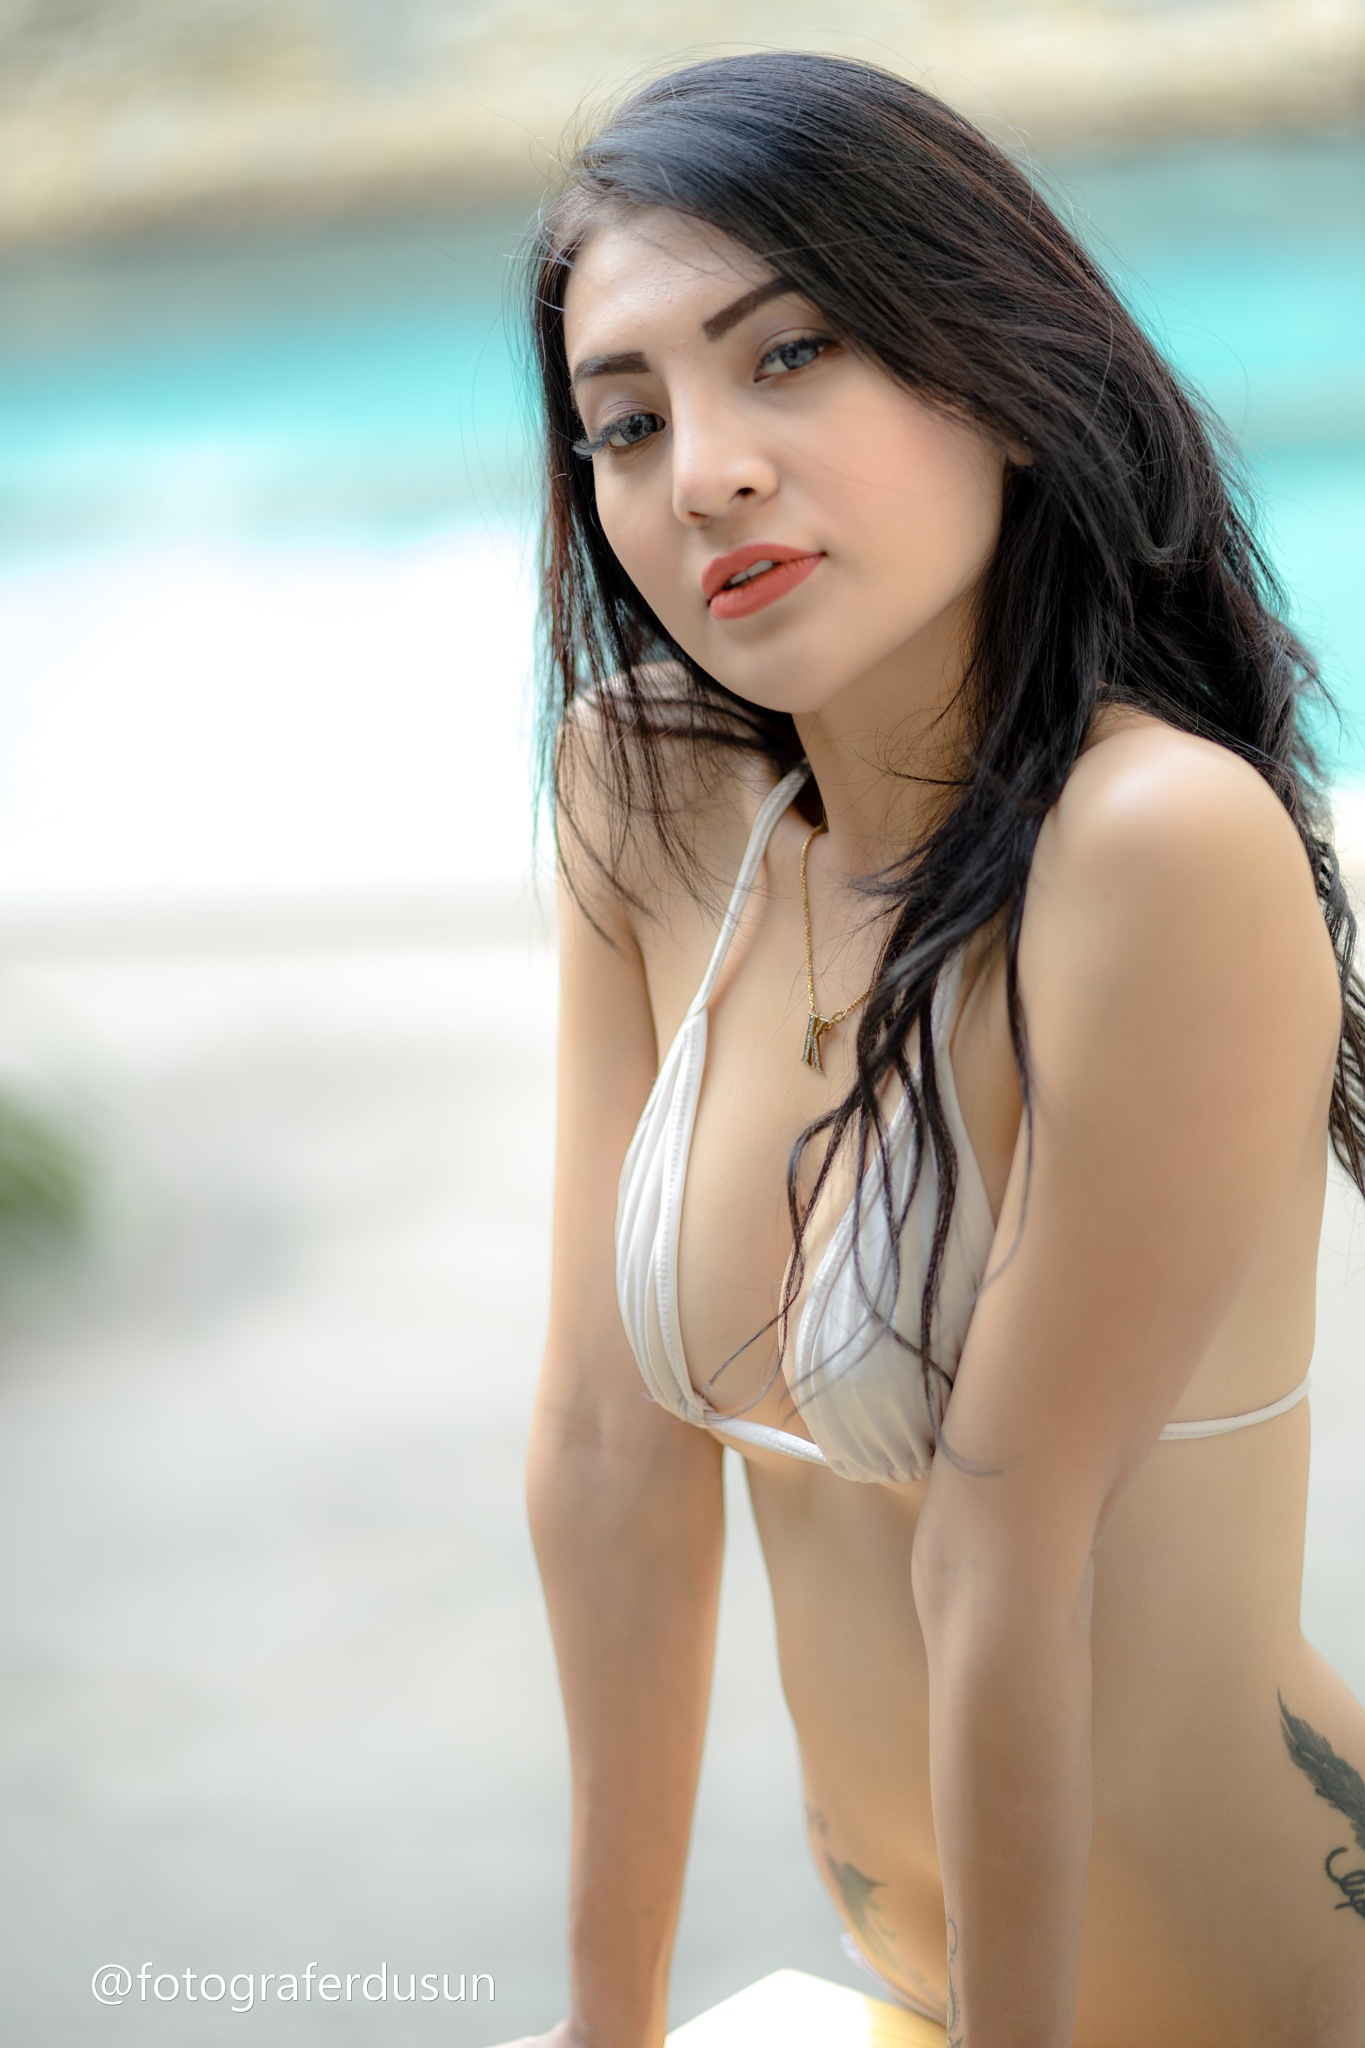 sexy white by Fotografer Dusun